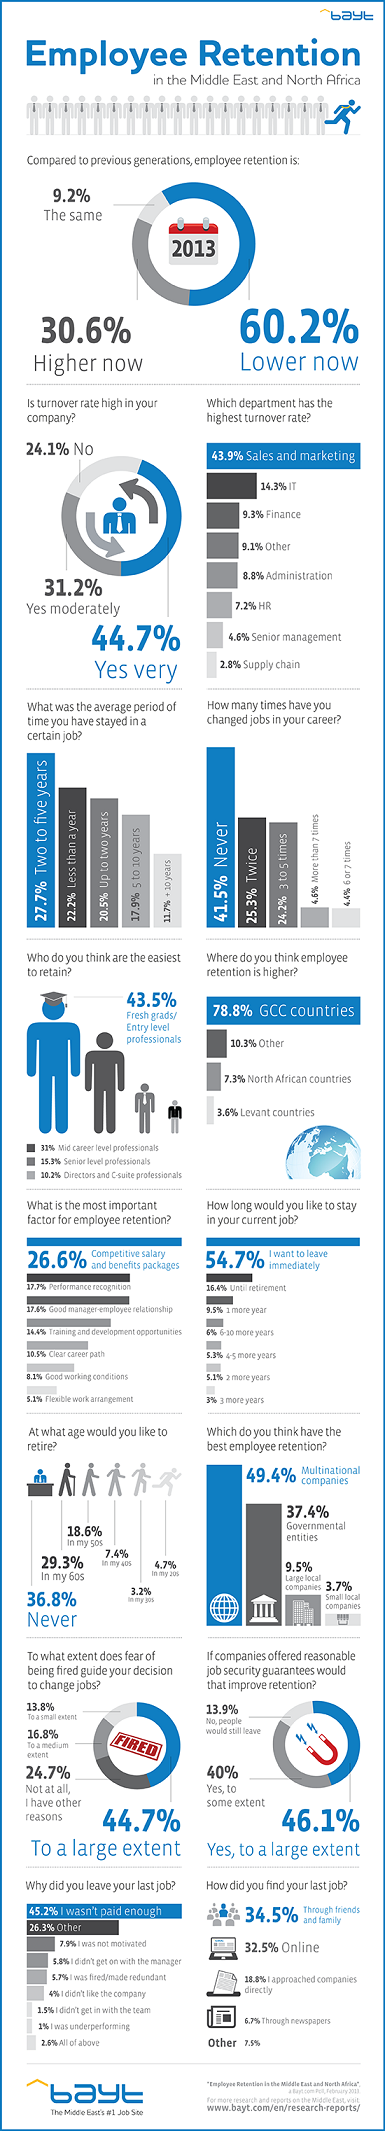 Employees Retention in MENA region #infographic